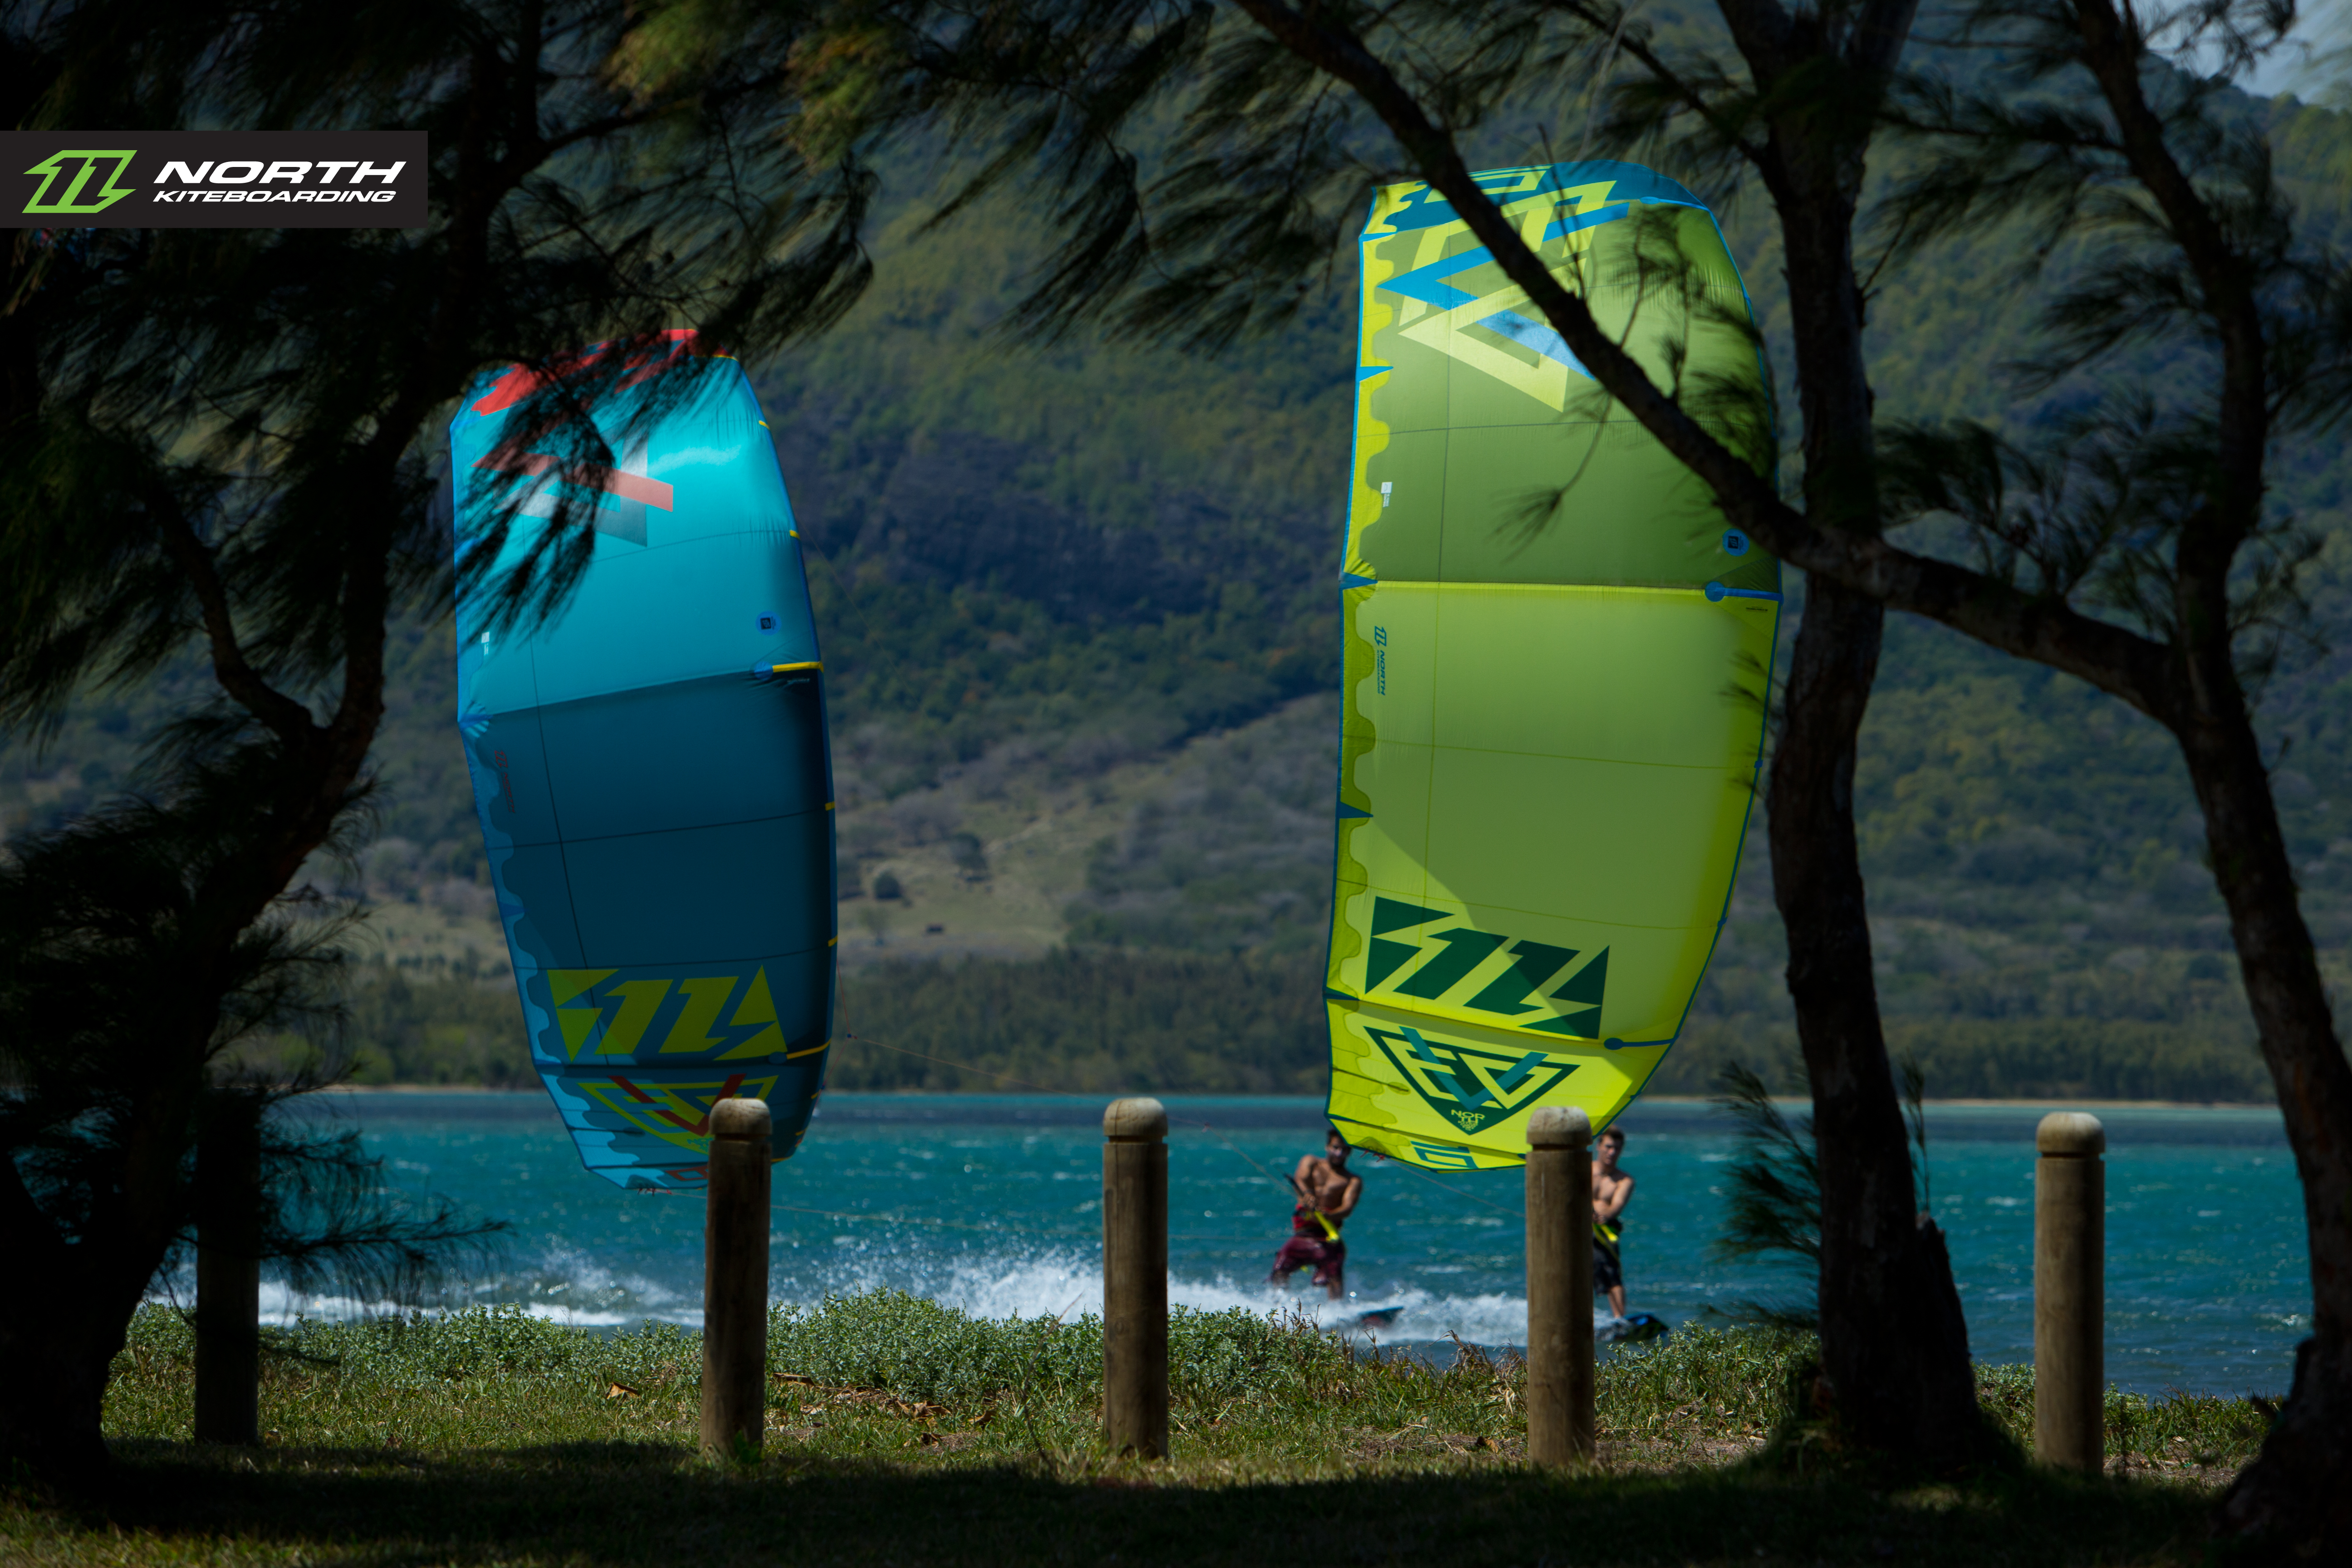 kitesurf wallpaper image - North Evo 2015 duo cruising between the trees - kitesurfing - in resolution: Original 5184 X 3456